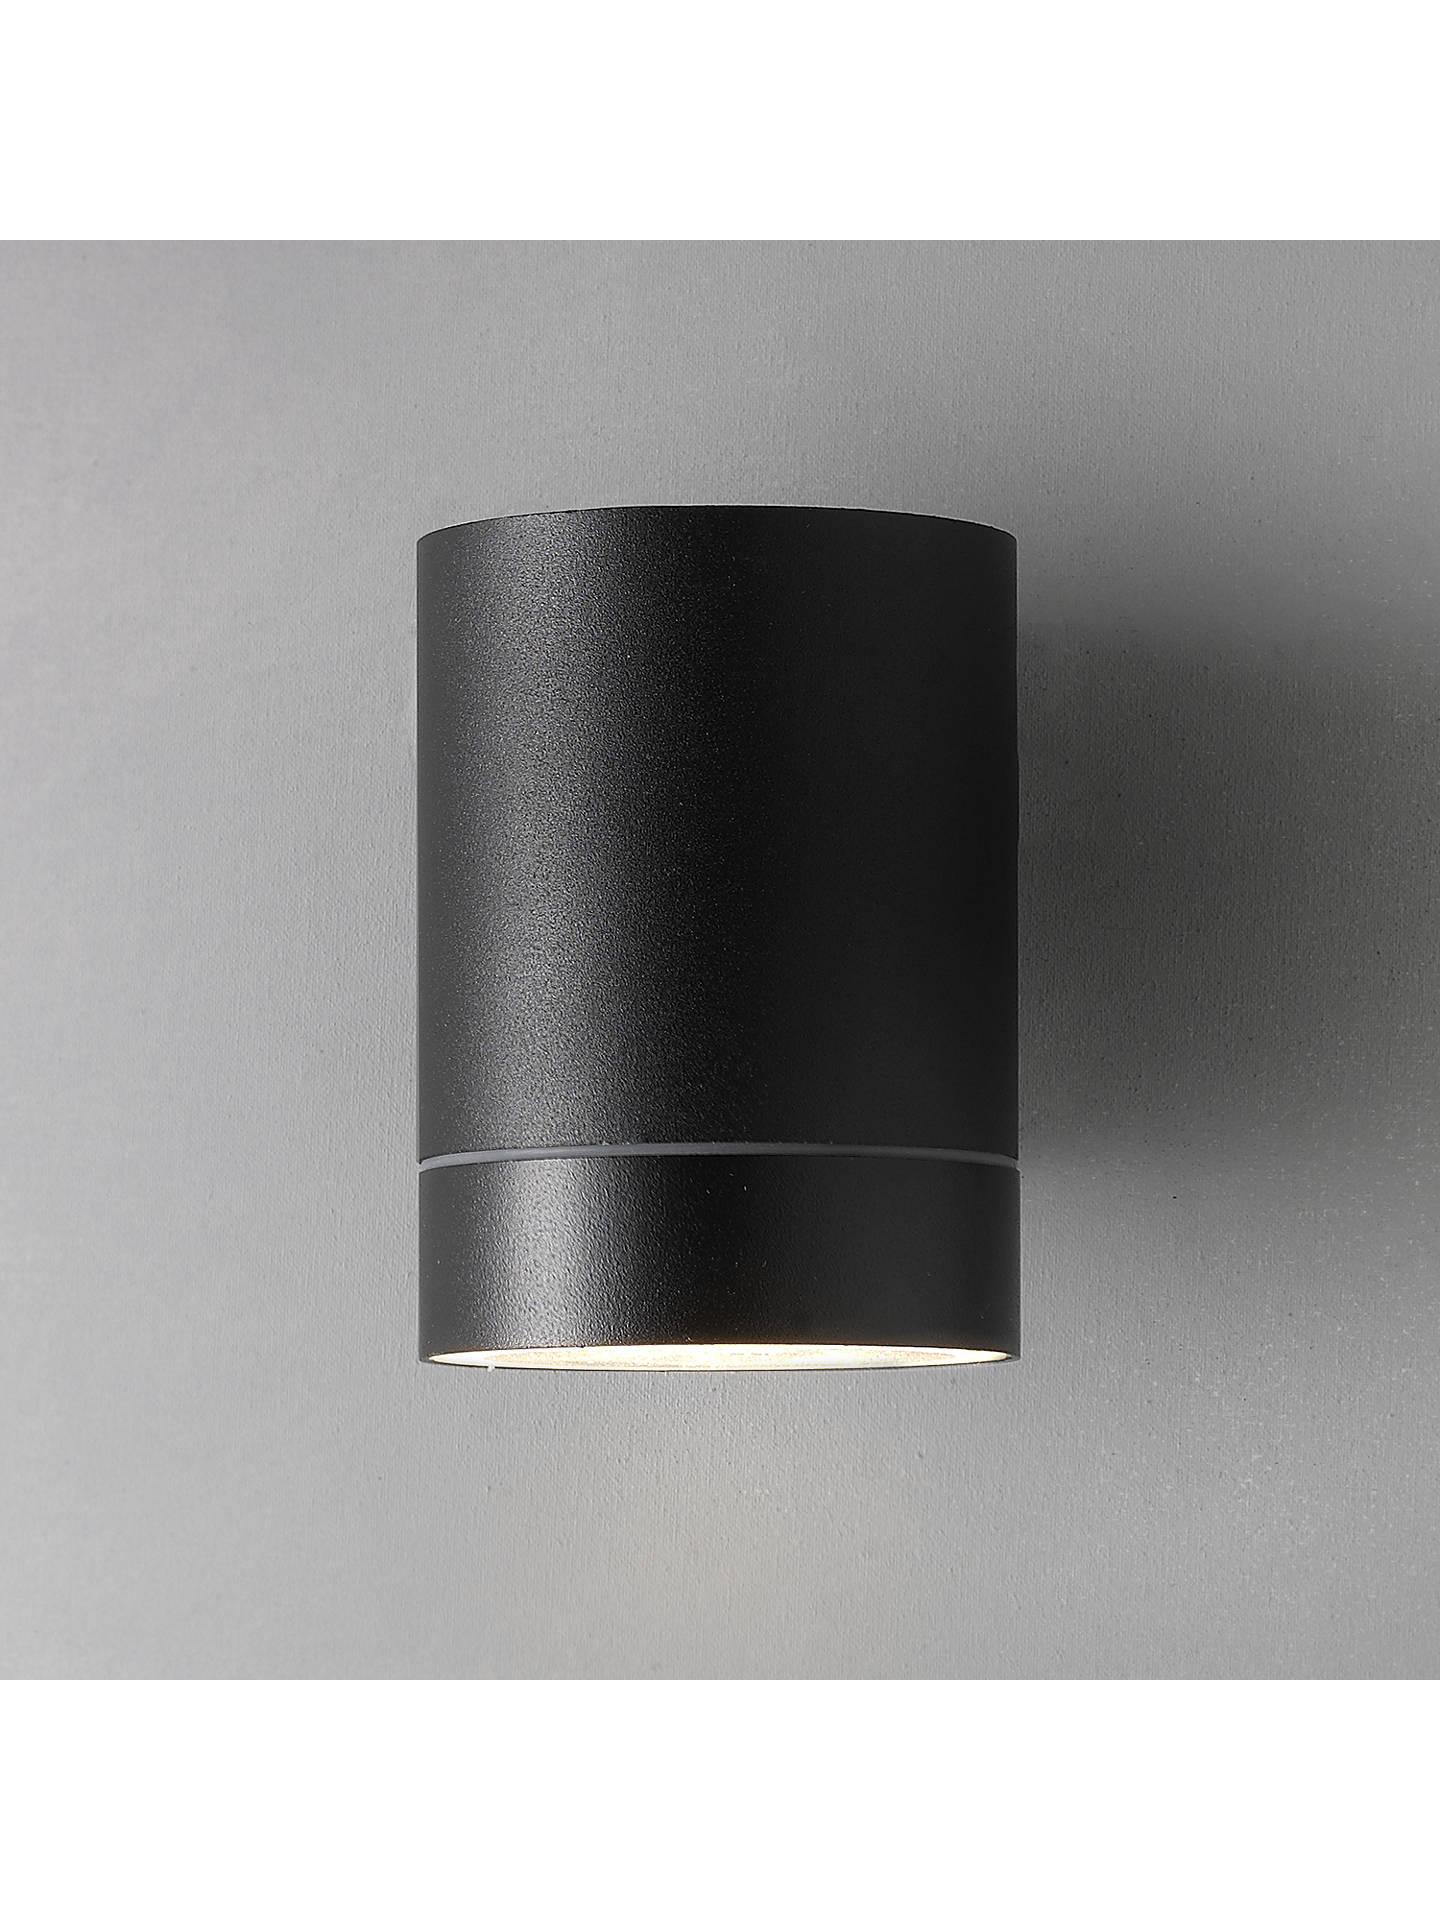 Nordlux Tin Maxi Outdoor Wall Light Black At John Lewis Partners